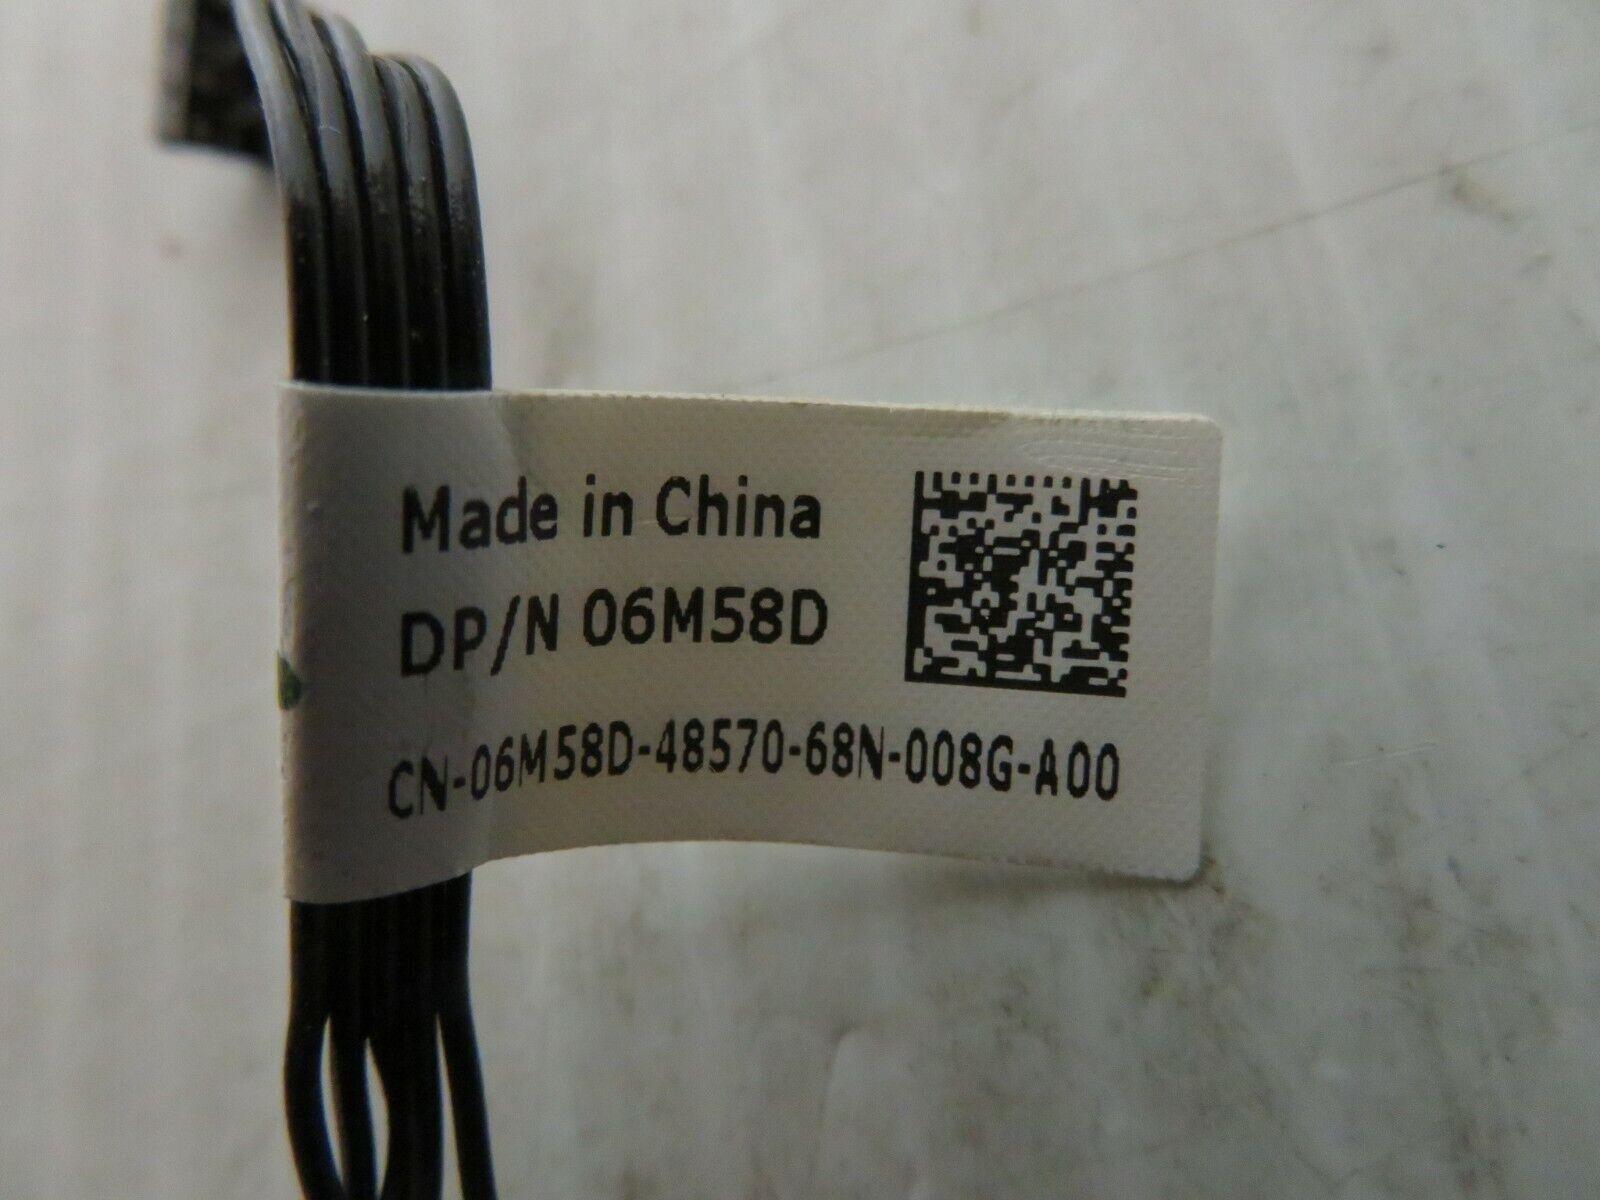 ns02 NEW GENUINE Dell Precision T3420 SFF Power Button Cable 6M58D 06M58D